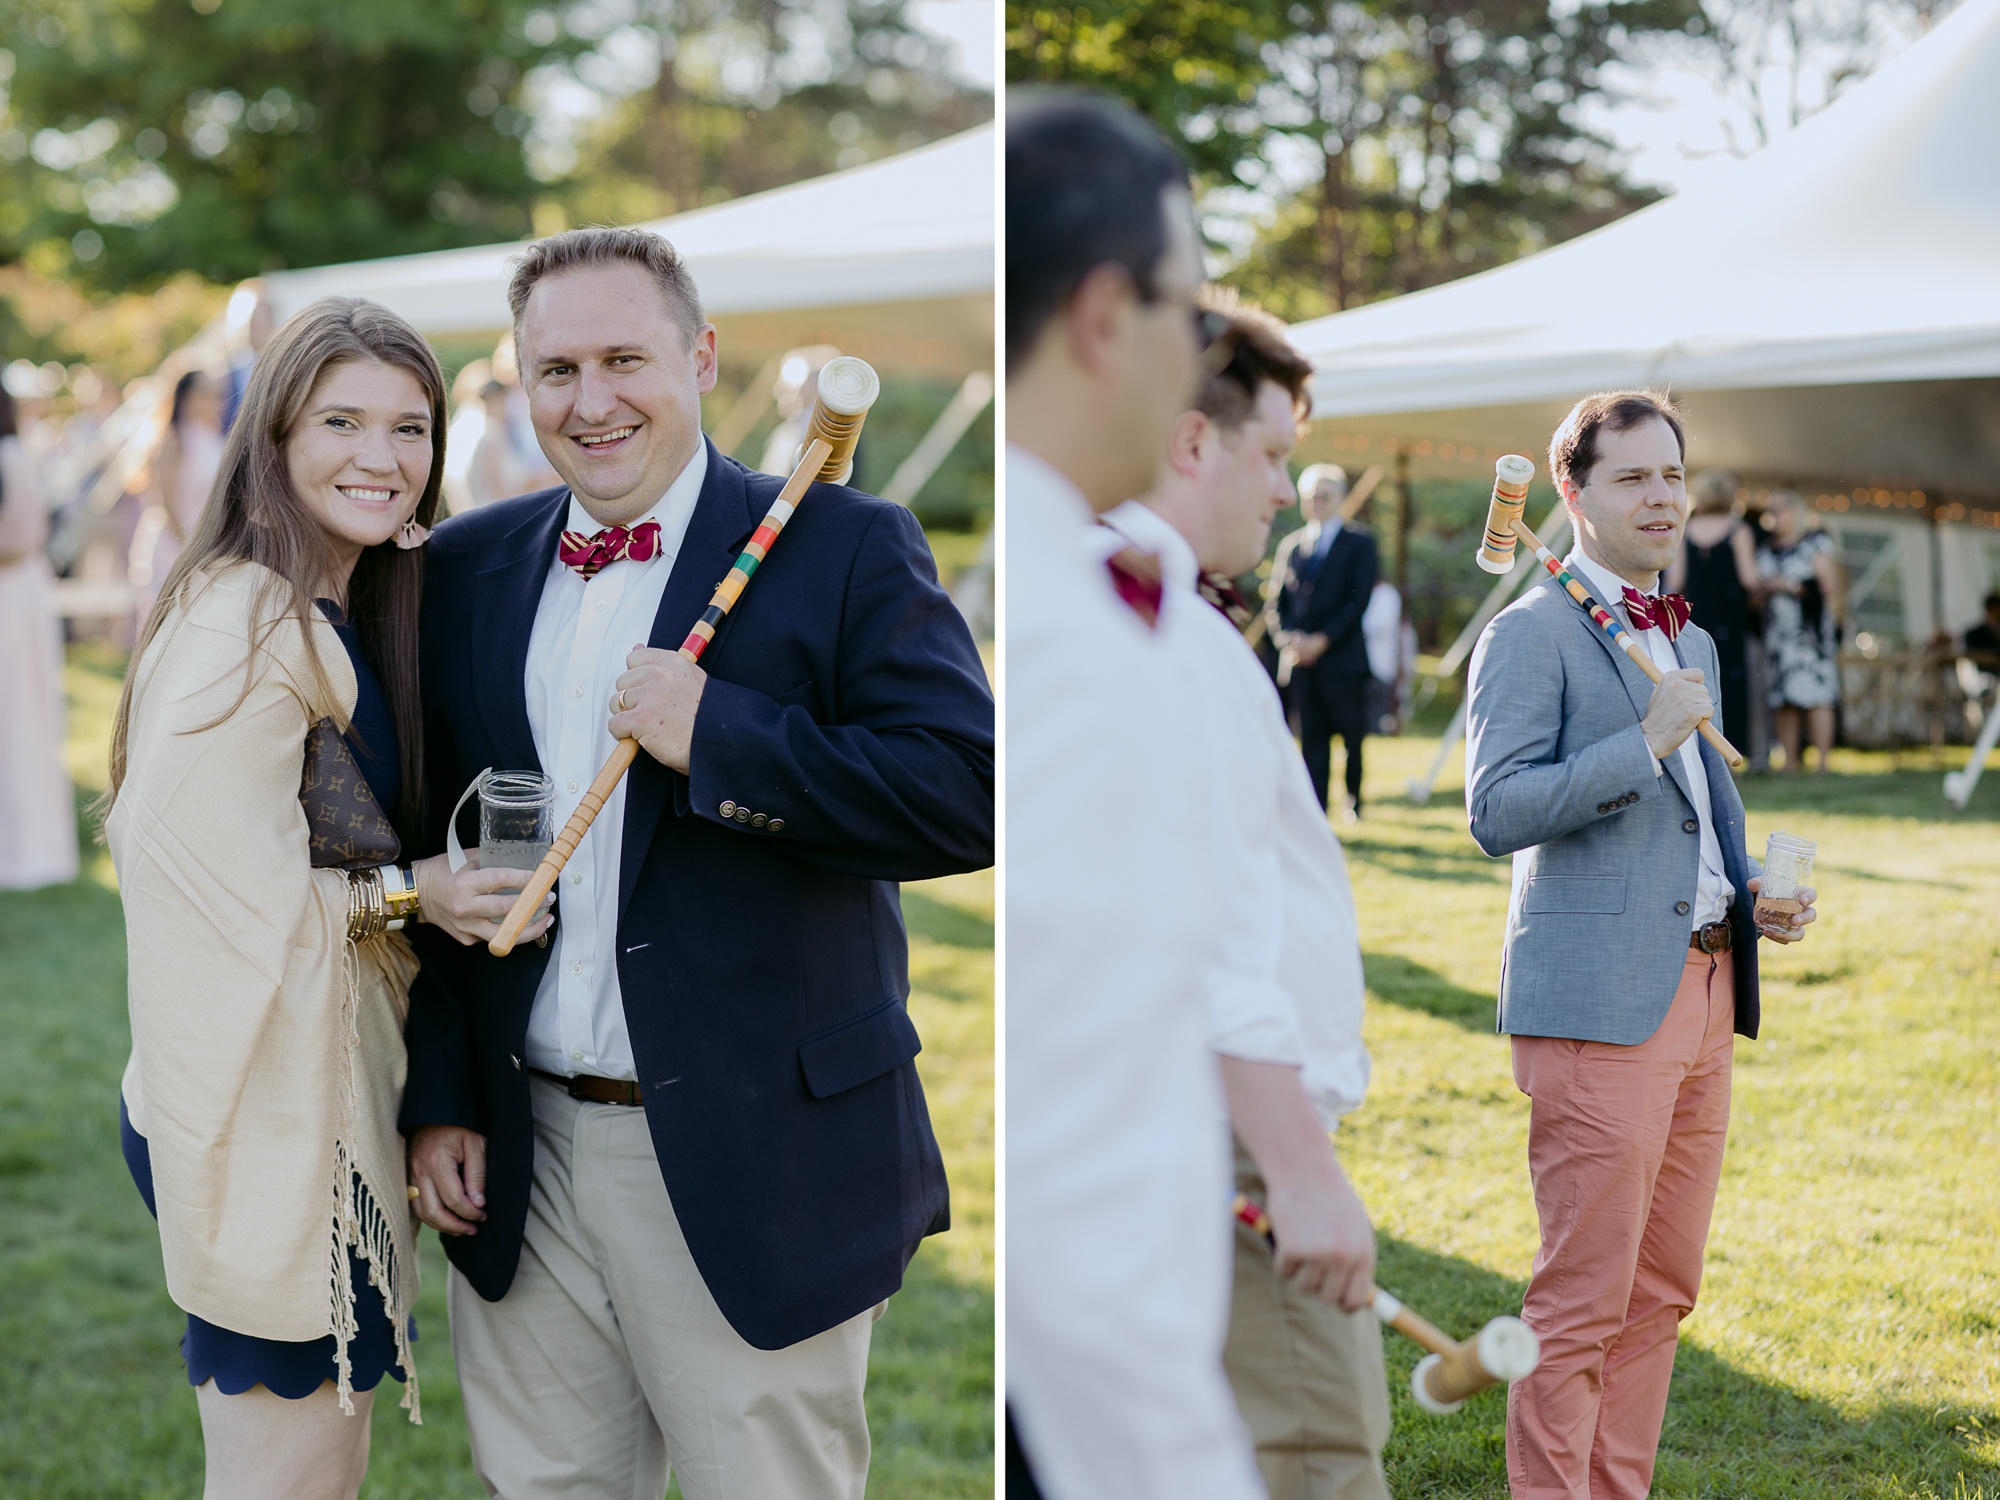 Livewell_Farm_wedding_Harpswell_maine_Meghan_Jim_020.jpg